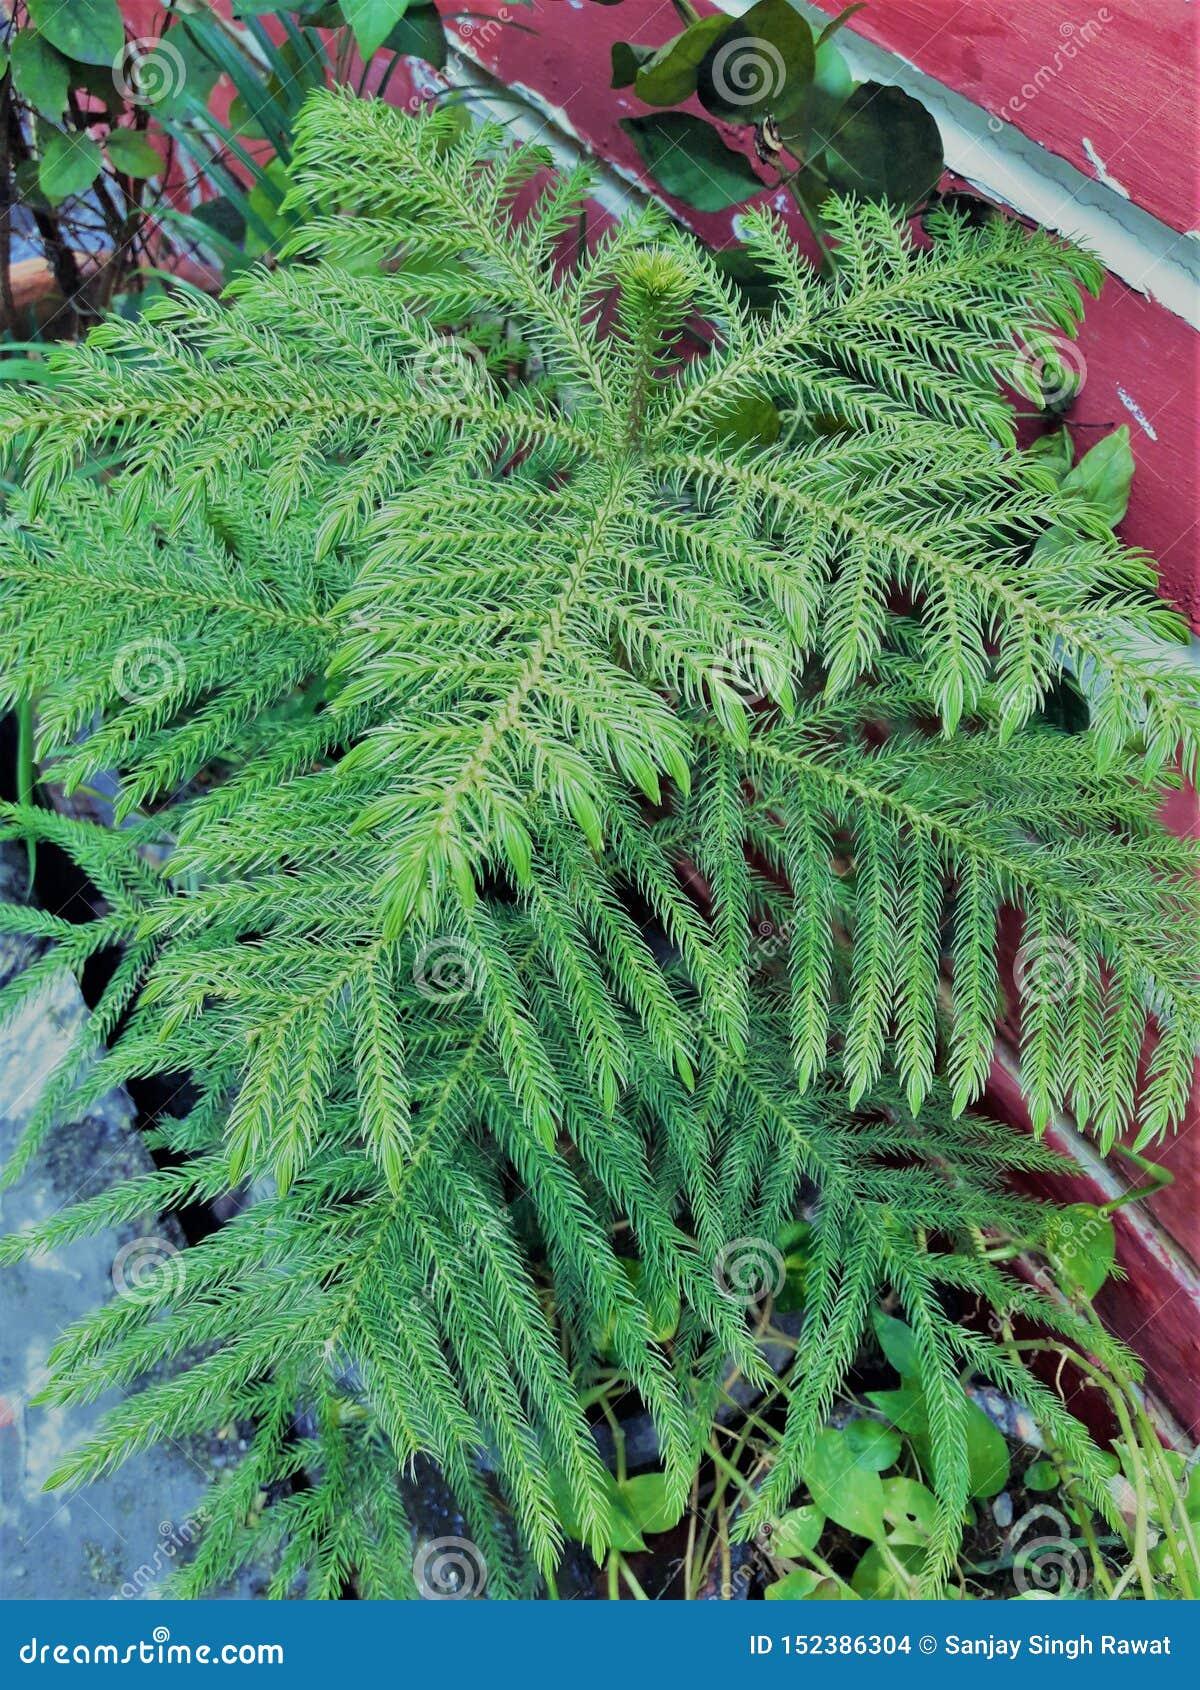 Een Mooie Struisvogel Fern Green Plant